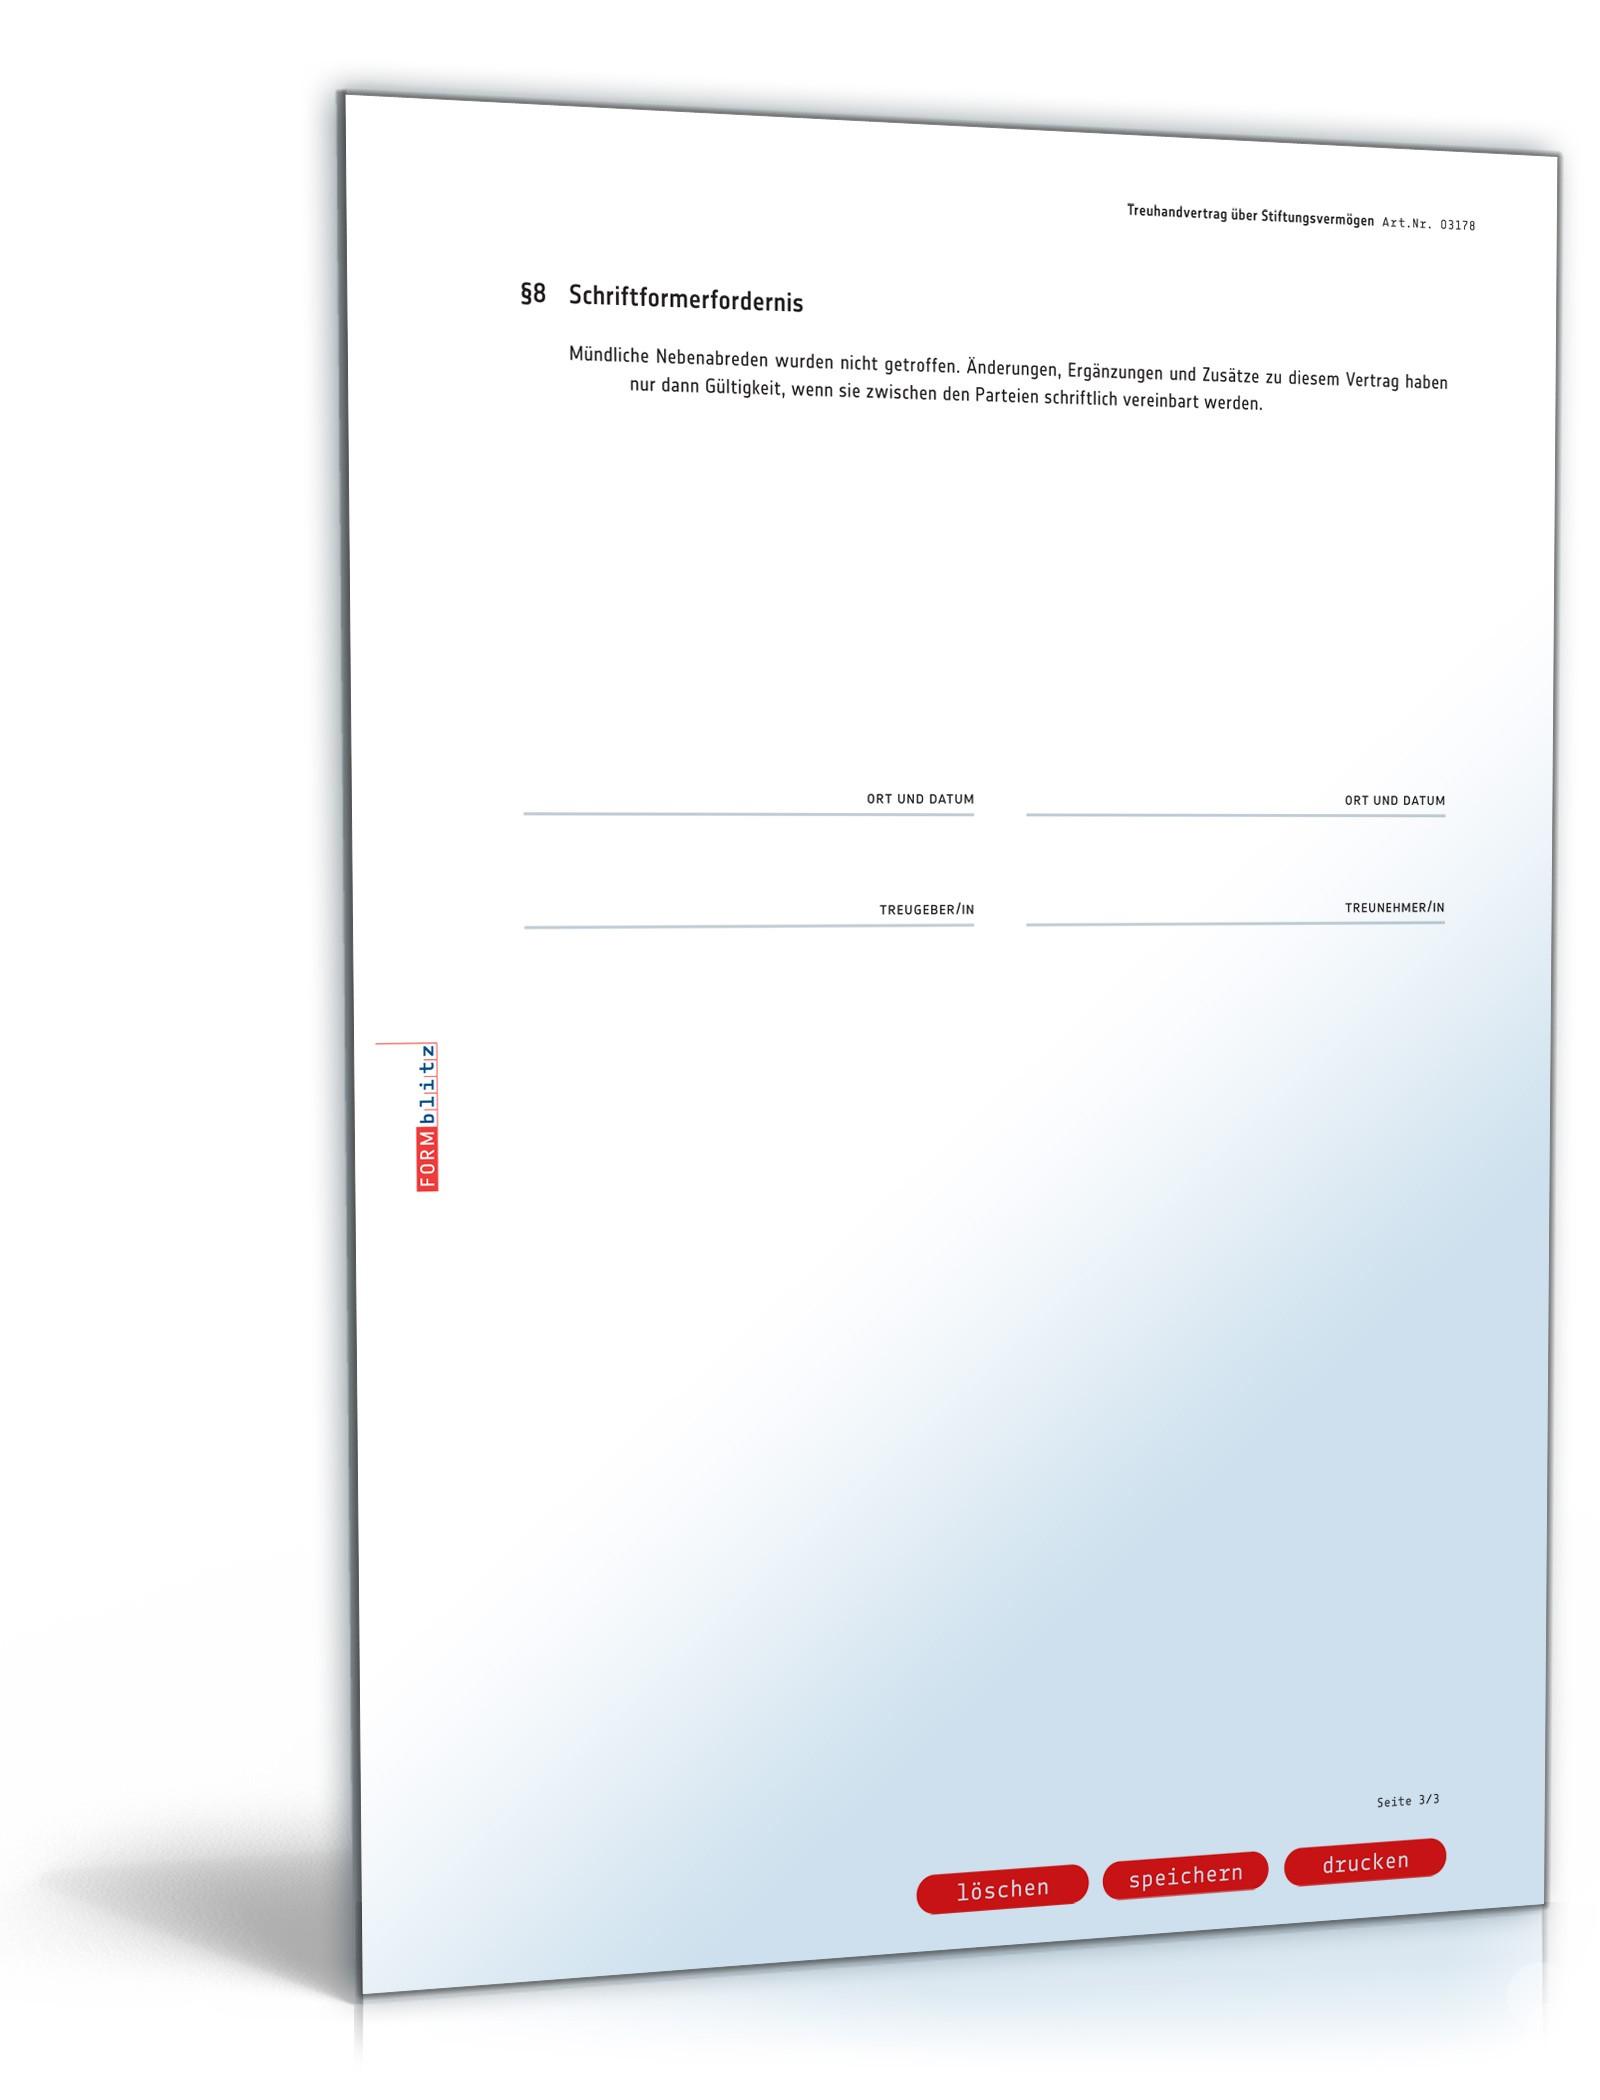 pdf seite 3 - Treuhandvertrag Muster